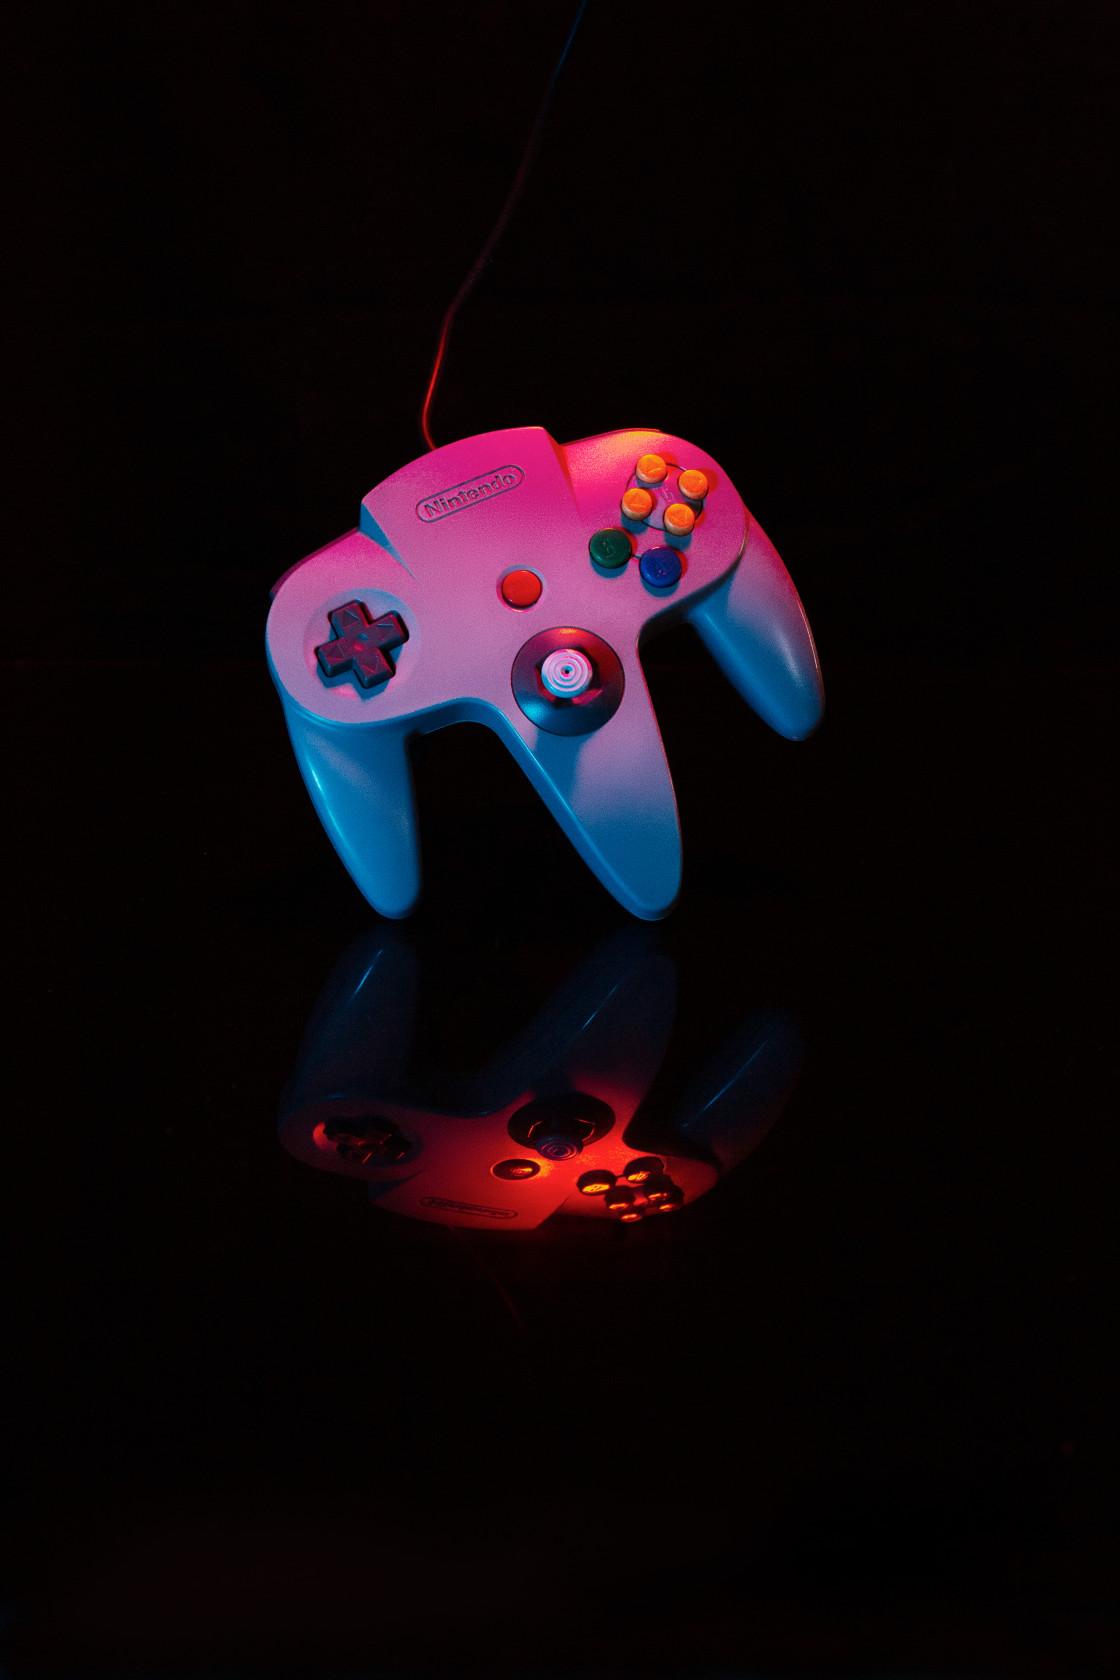 """Nintendo 64 controller"" stock image"